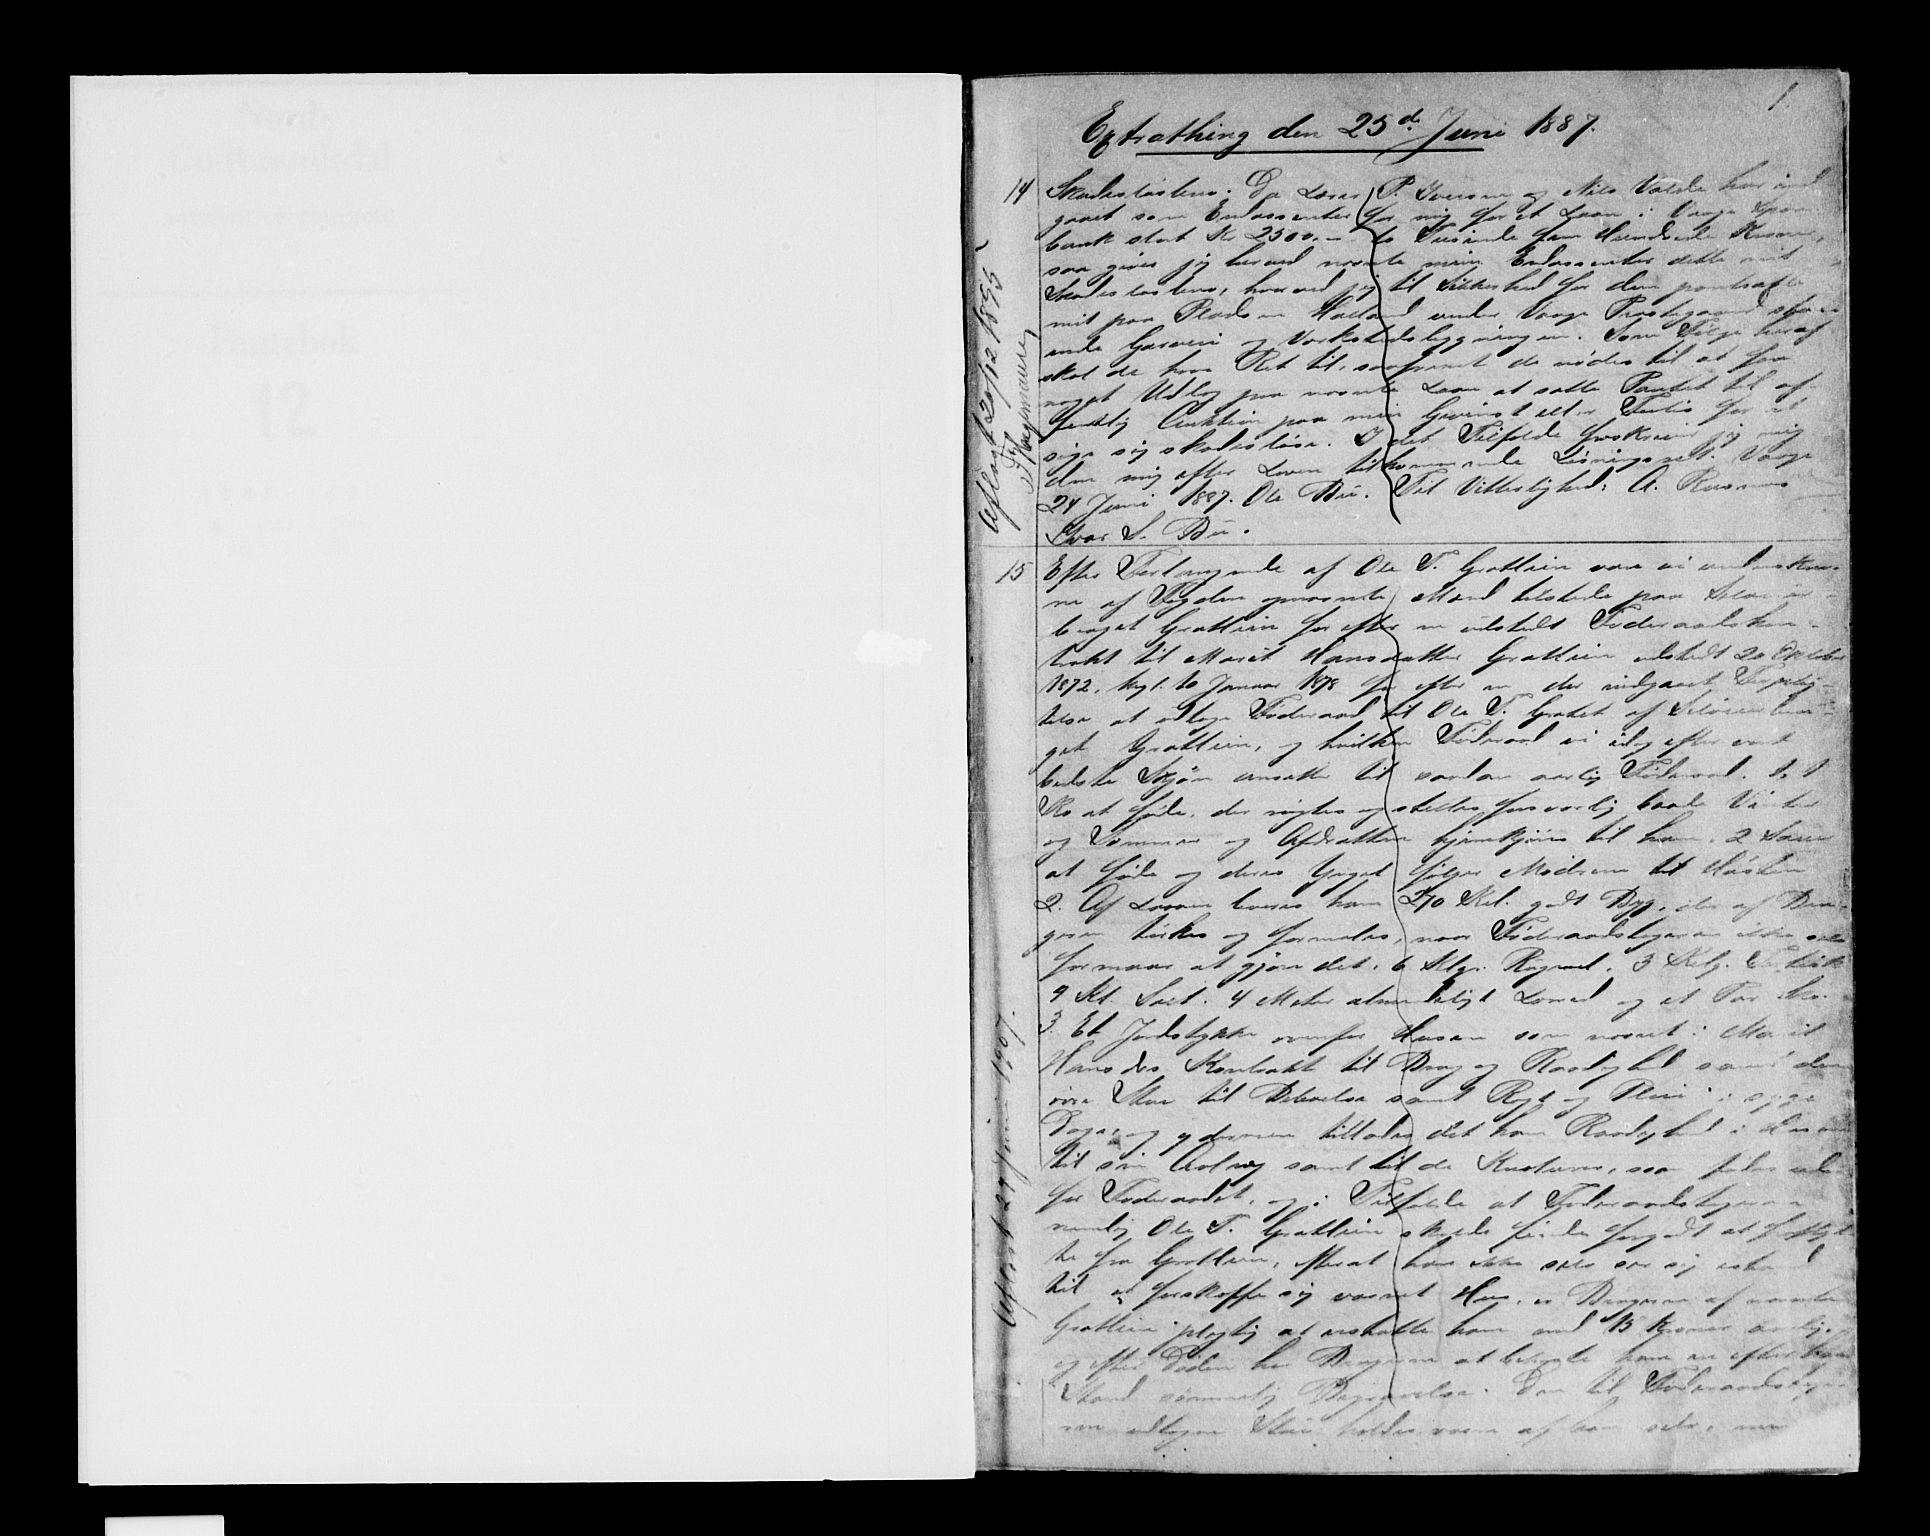 SAH, Nord-Gudbrandsdal tingrett, H/Hb/Hba/L0012: Pantebok nr. 12, 1887-1892, s. 1